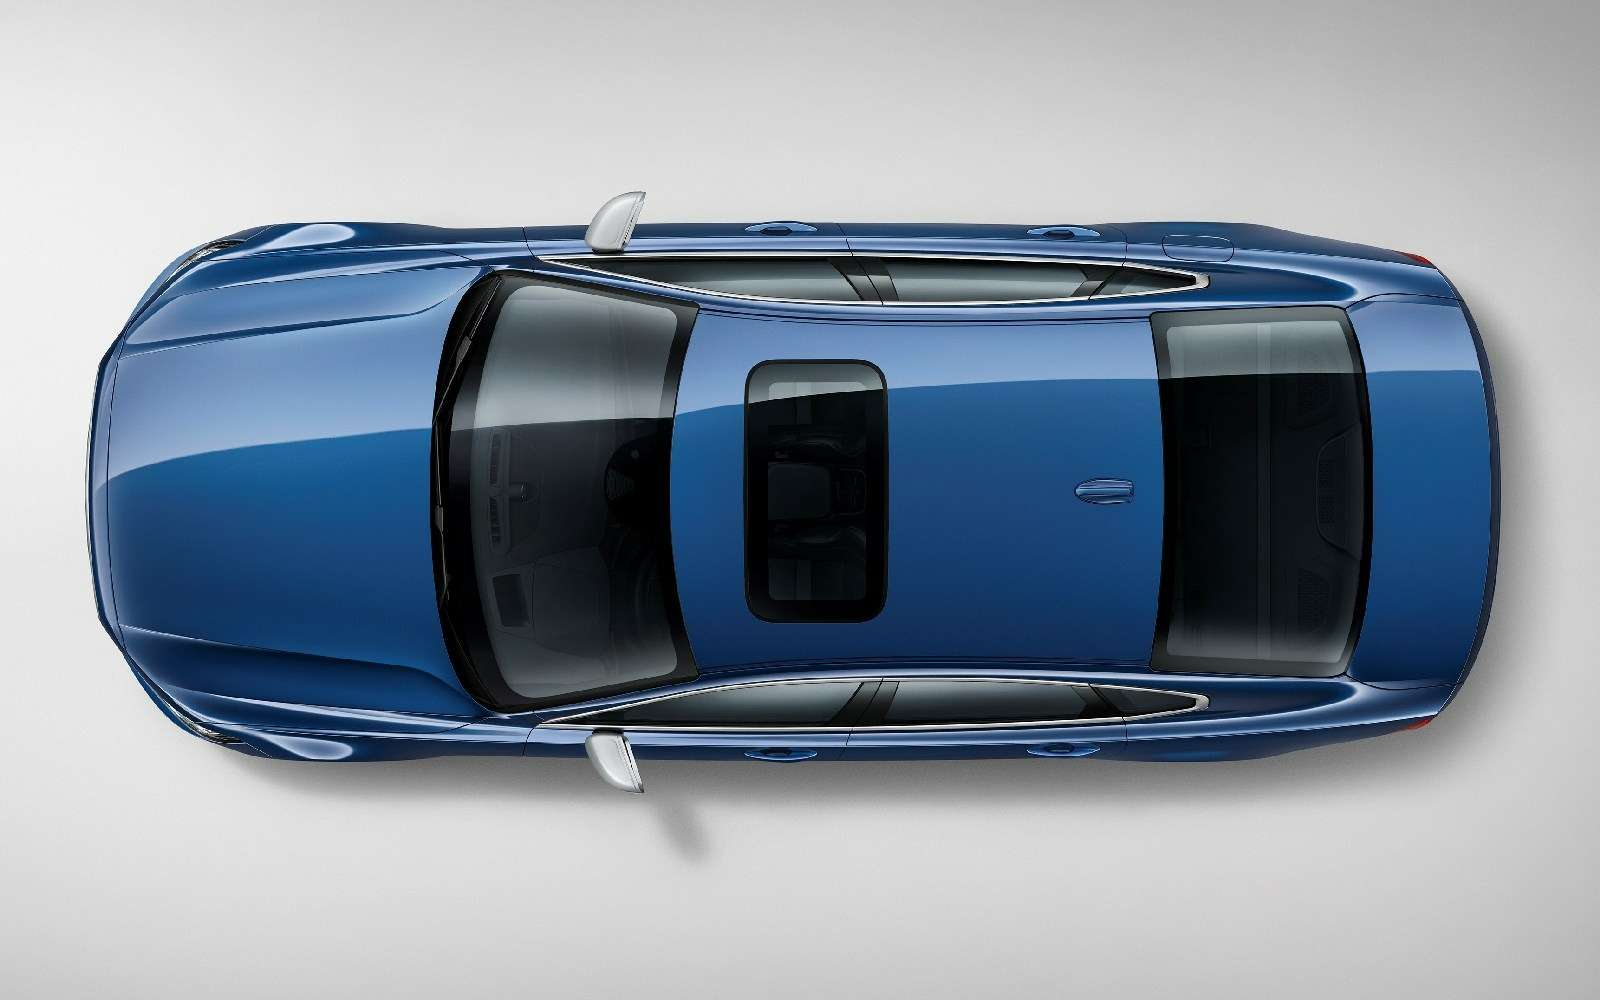 Volvo подготовила дляфлагманской модели спортпакет R-Design— фото 600925